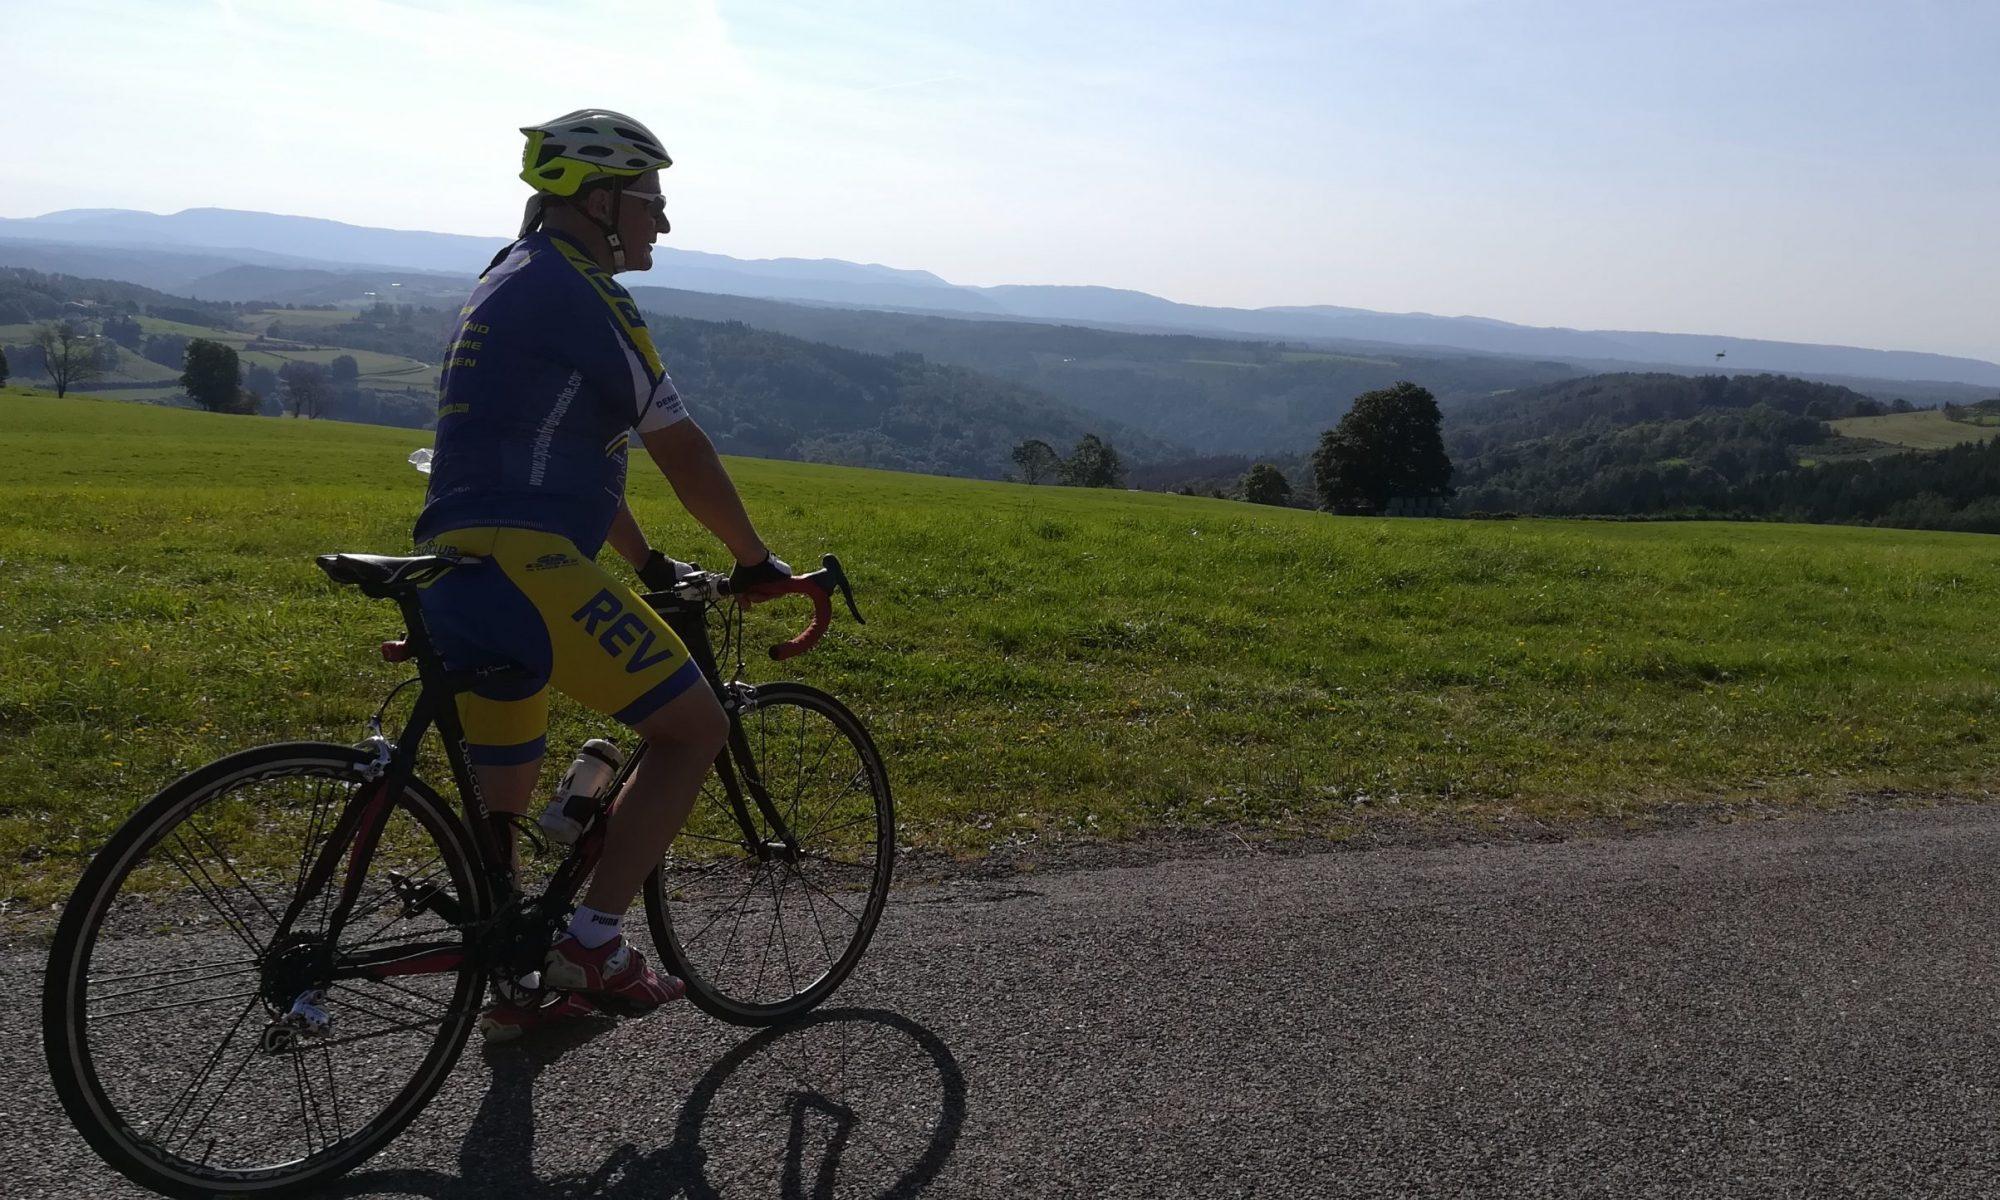 Cycloclub de Froideconche